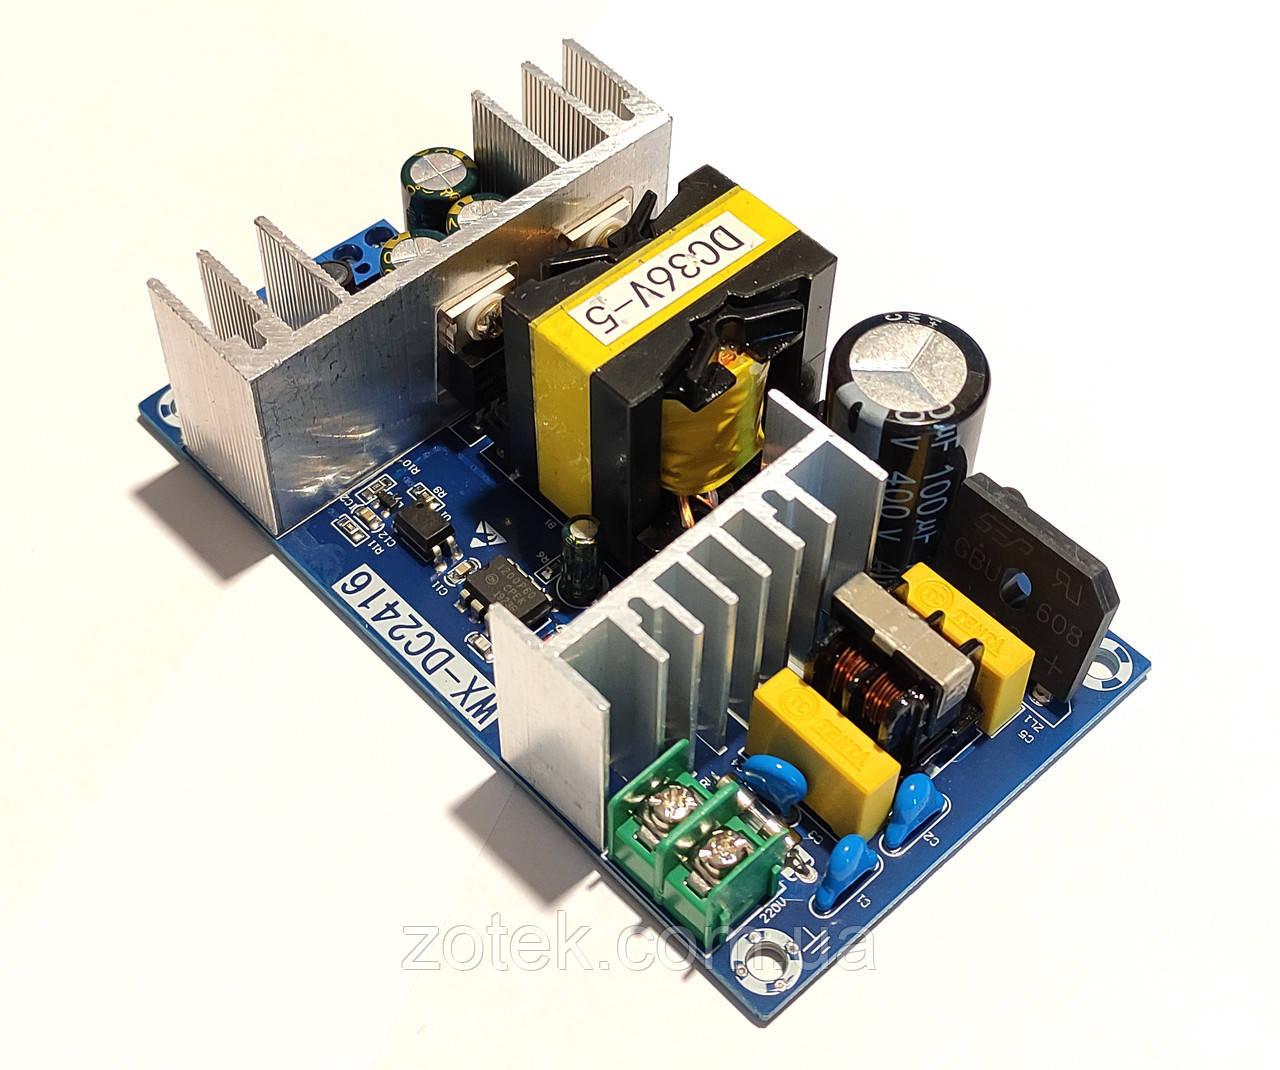 Microchip 36В 5А 6,5А 180 Вт Импульсный блок питания  AC-DC 36V 5A 180W